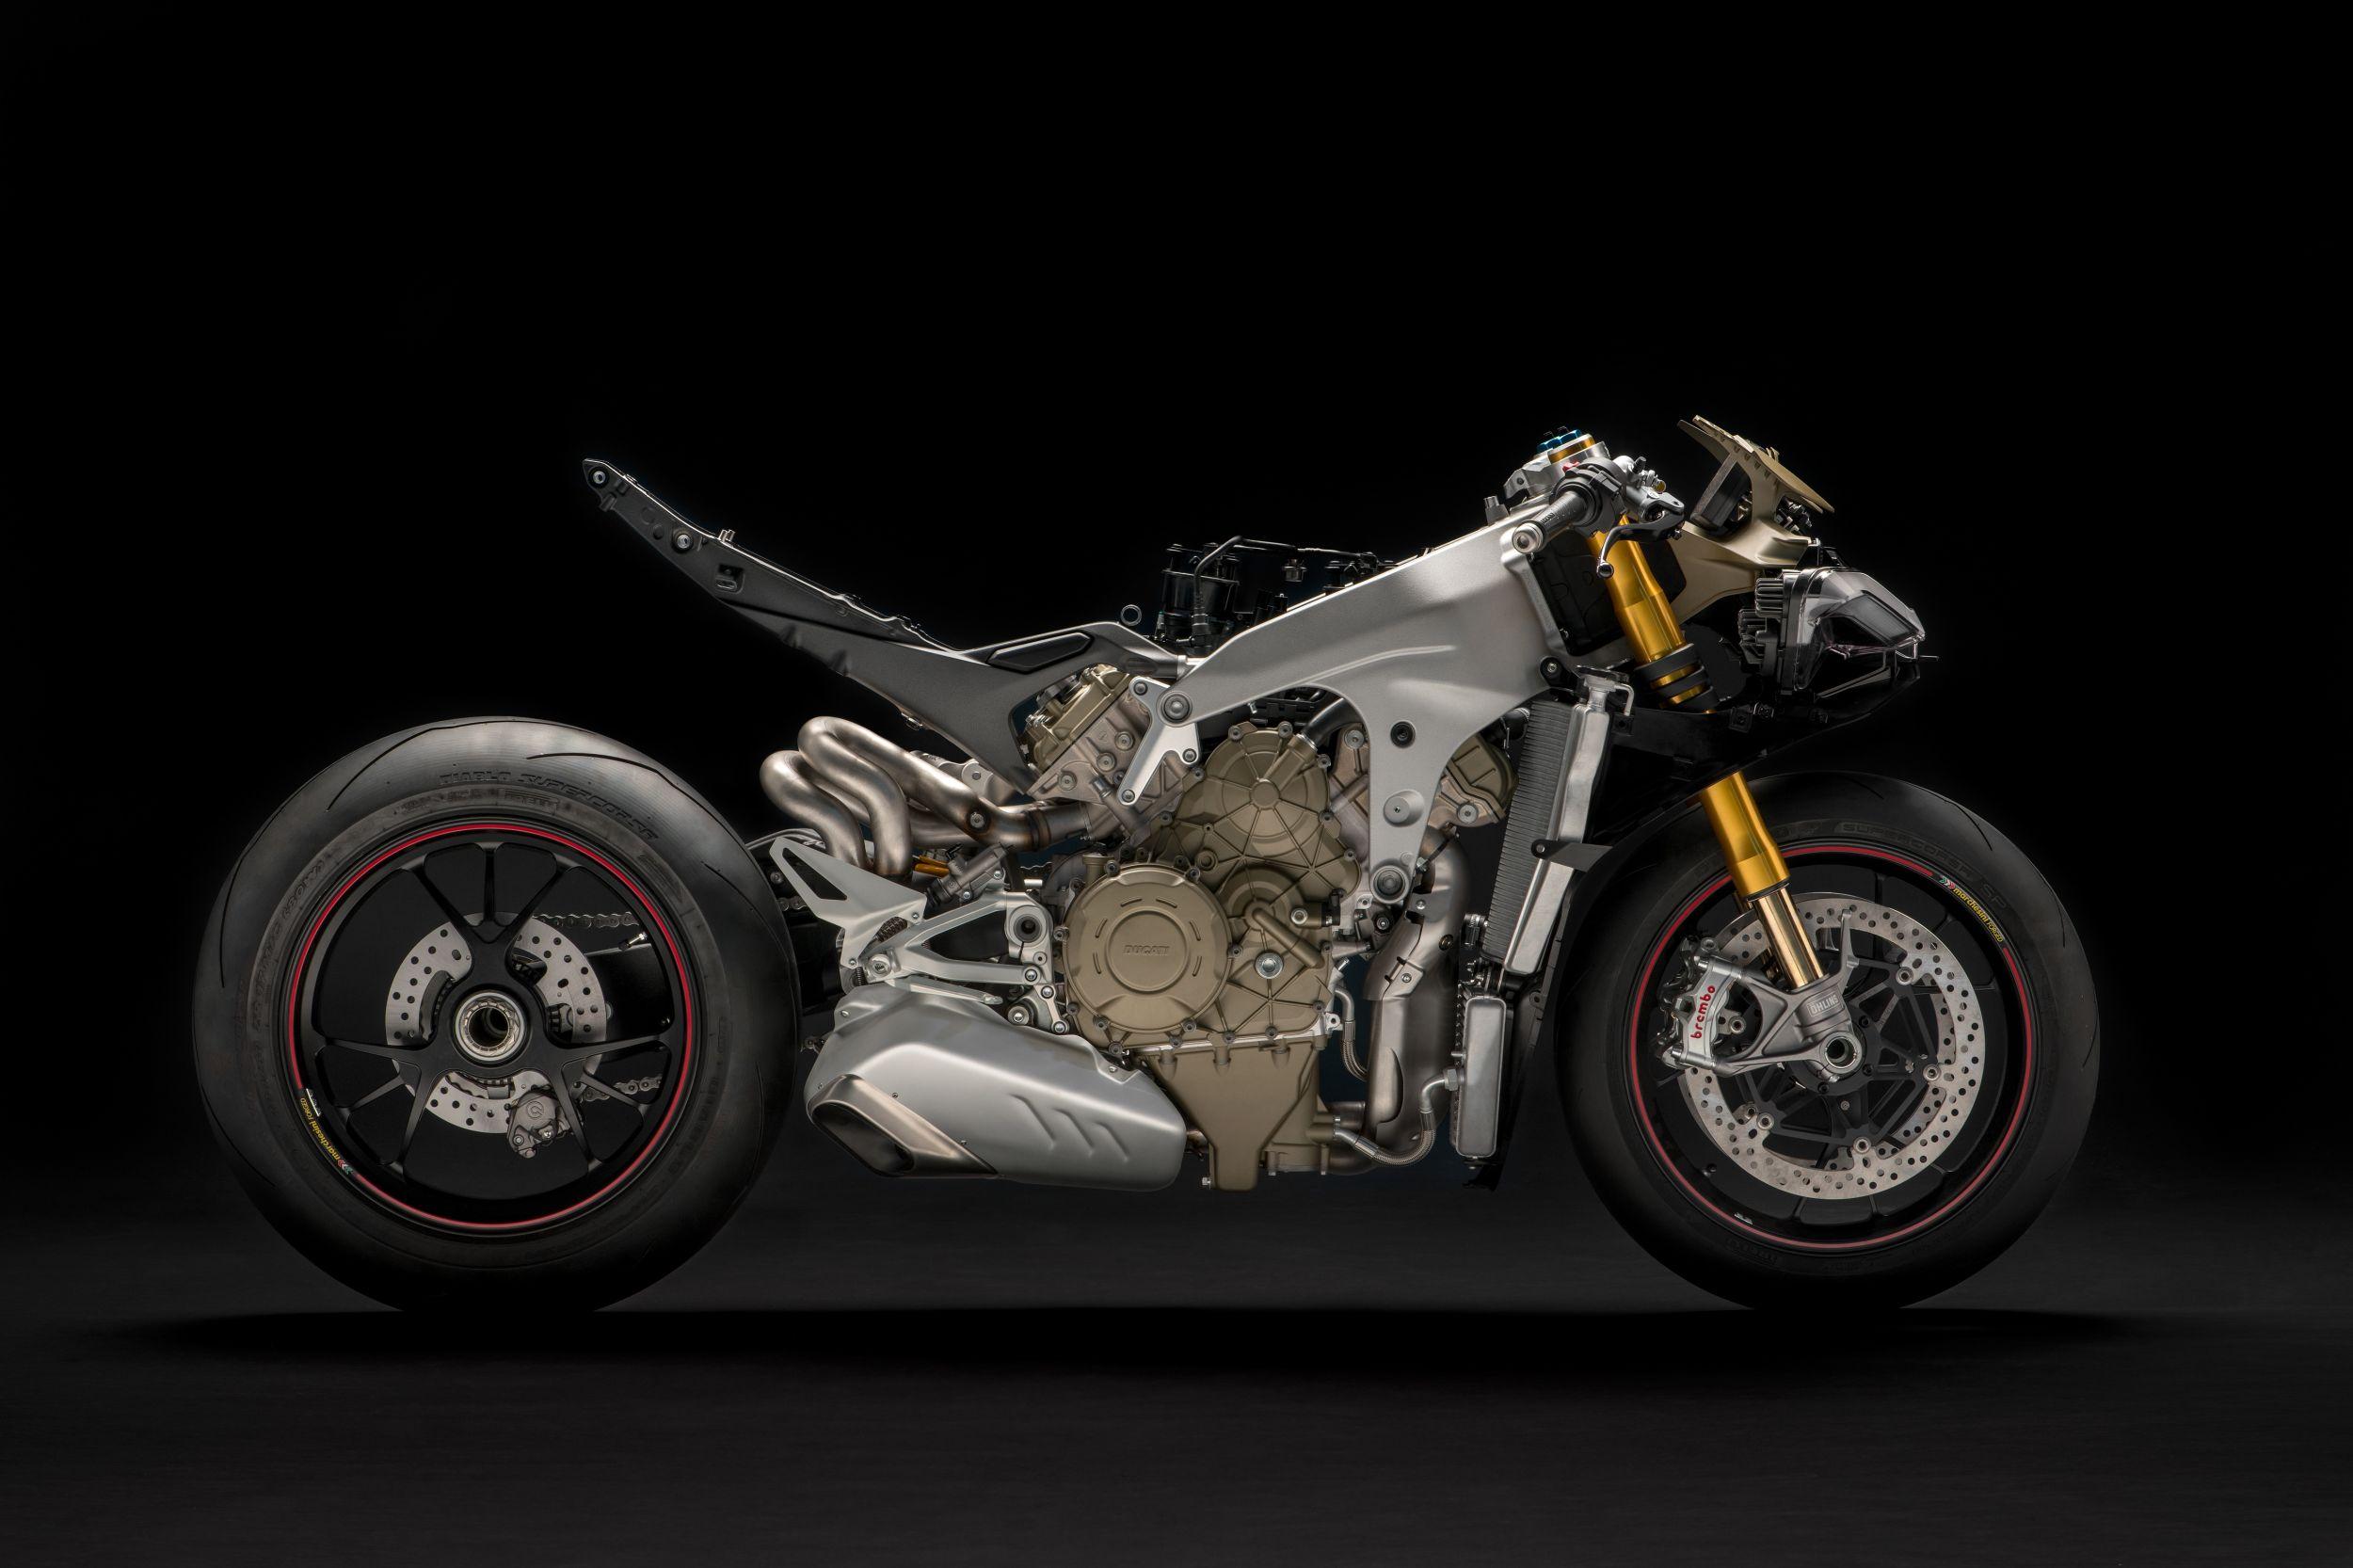 Ducati Panigale V4 - Alle technischen Daten zum Modell Panigale V4 ...